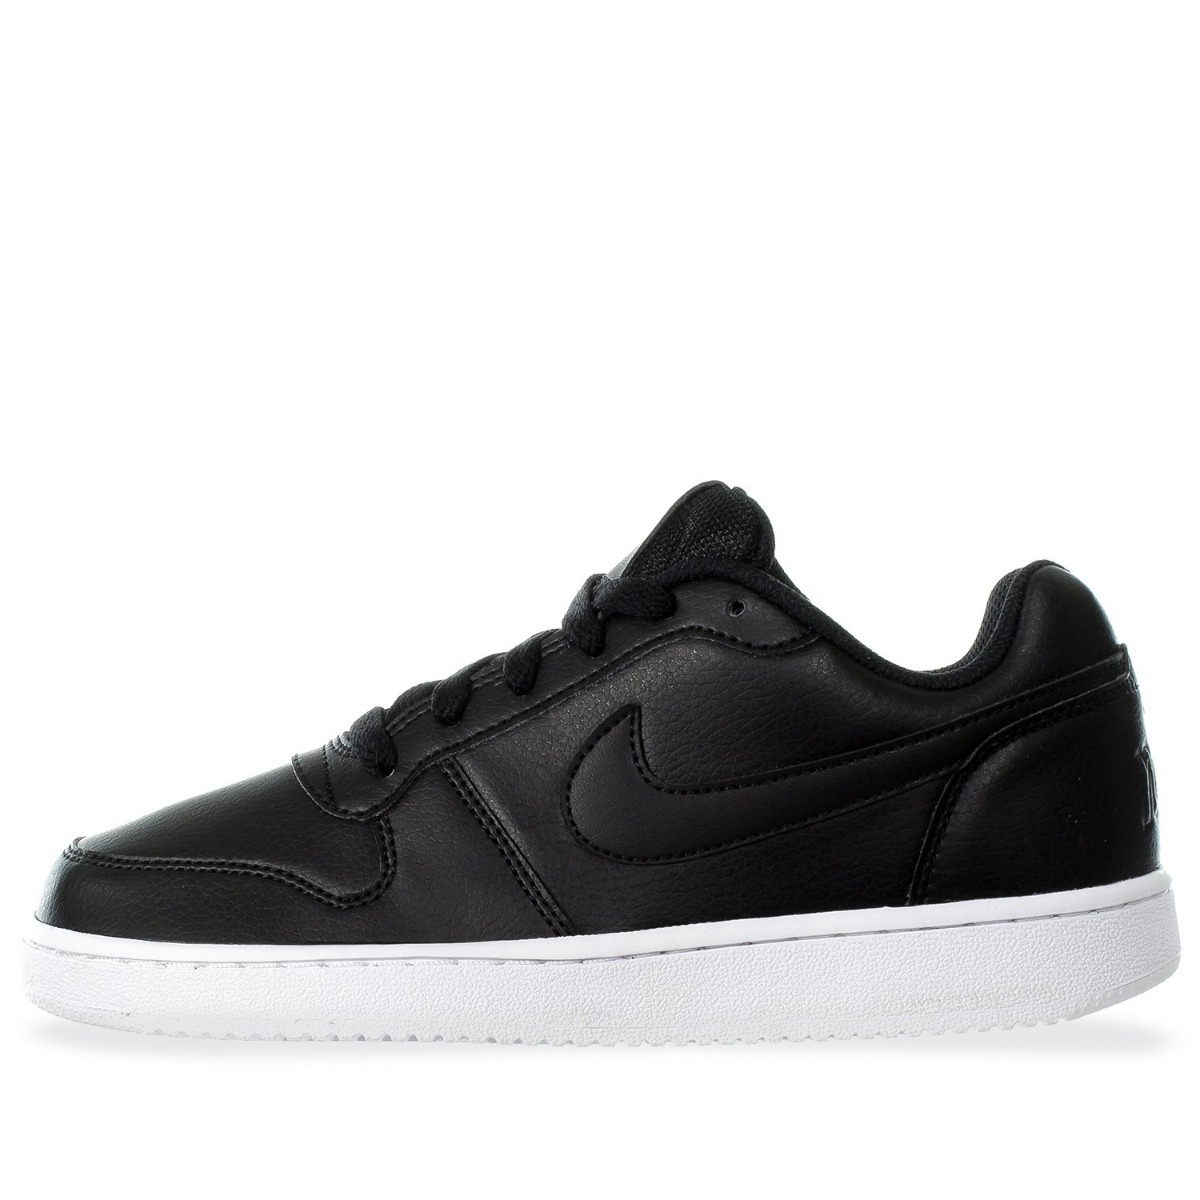 Zapatilla Nike Ebernon Negro Aq1779 001